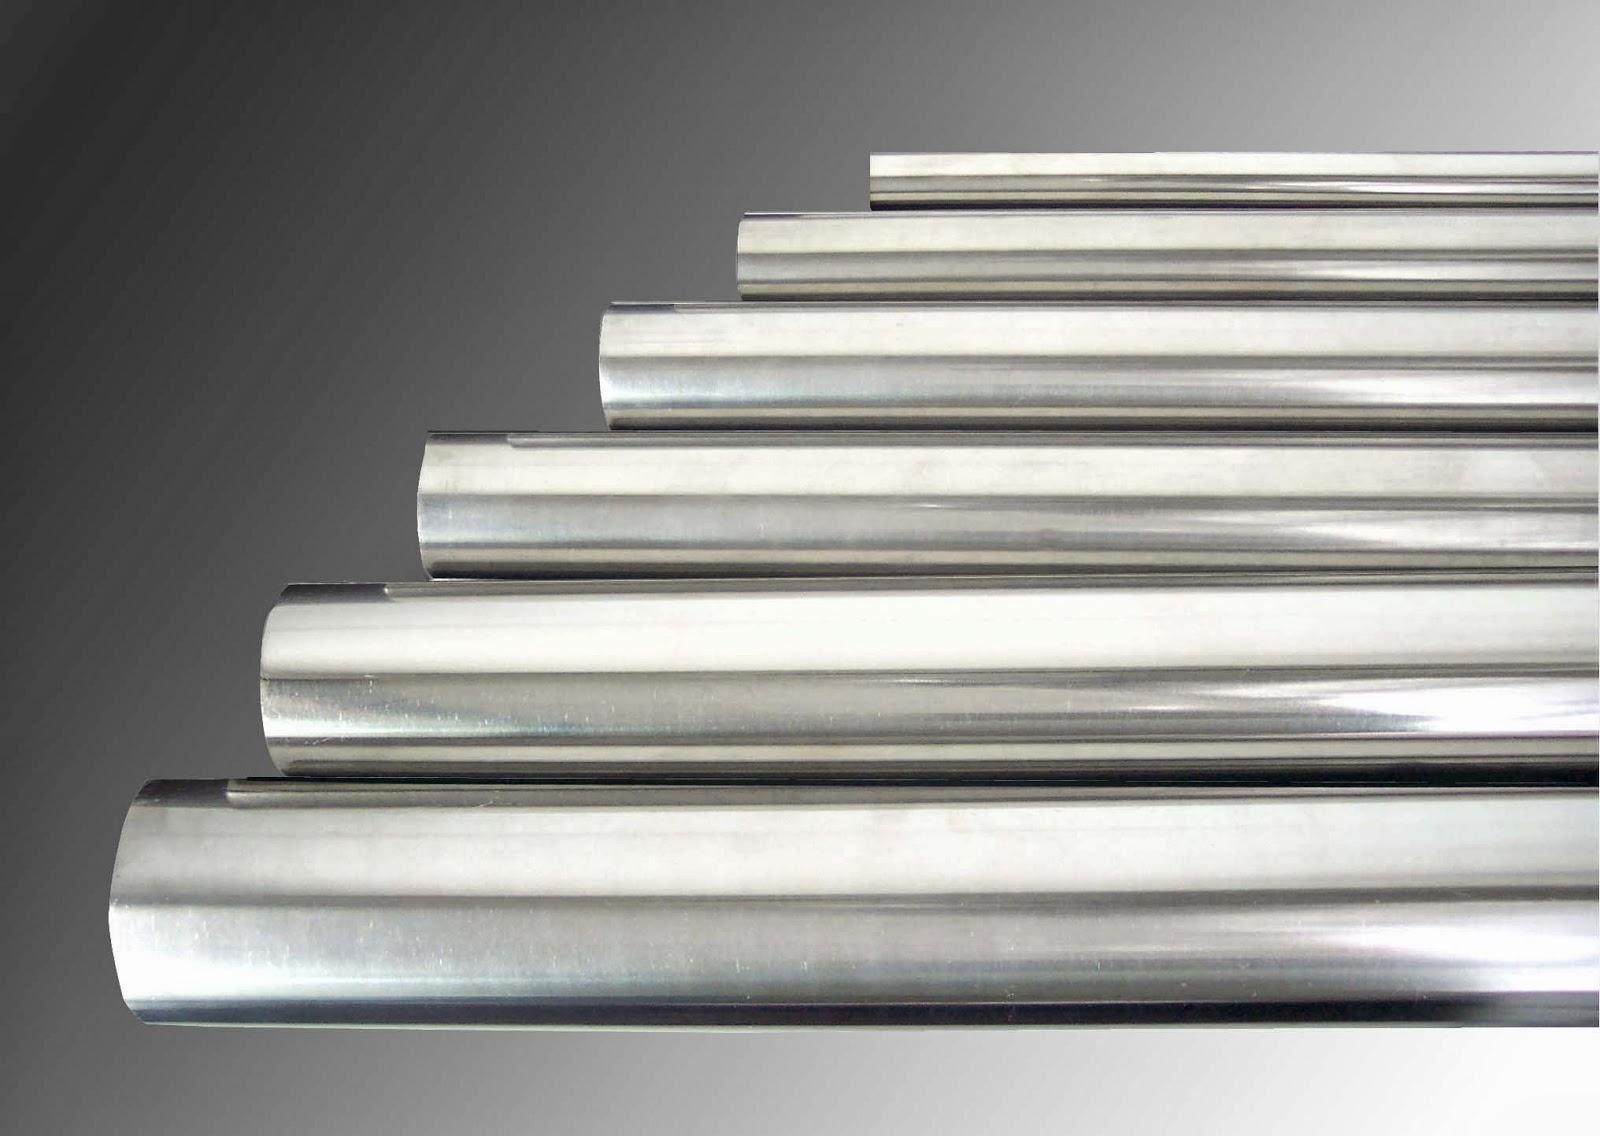 magnetic stainless steel austenitic ferritic martensitic. Black Bedroom Furniture Sets. Home Design Ideas